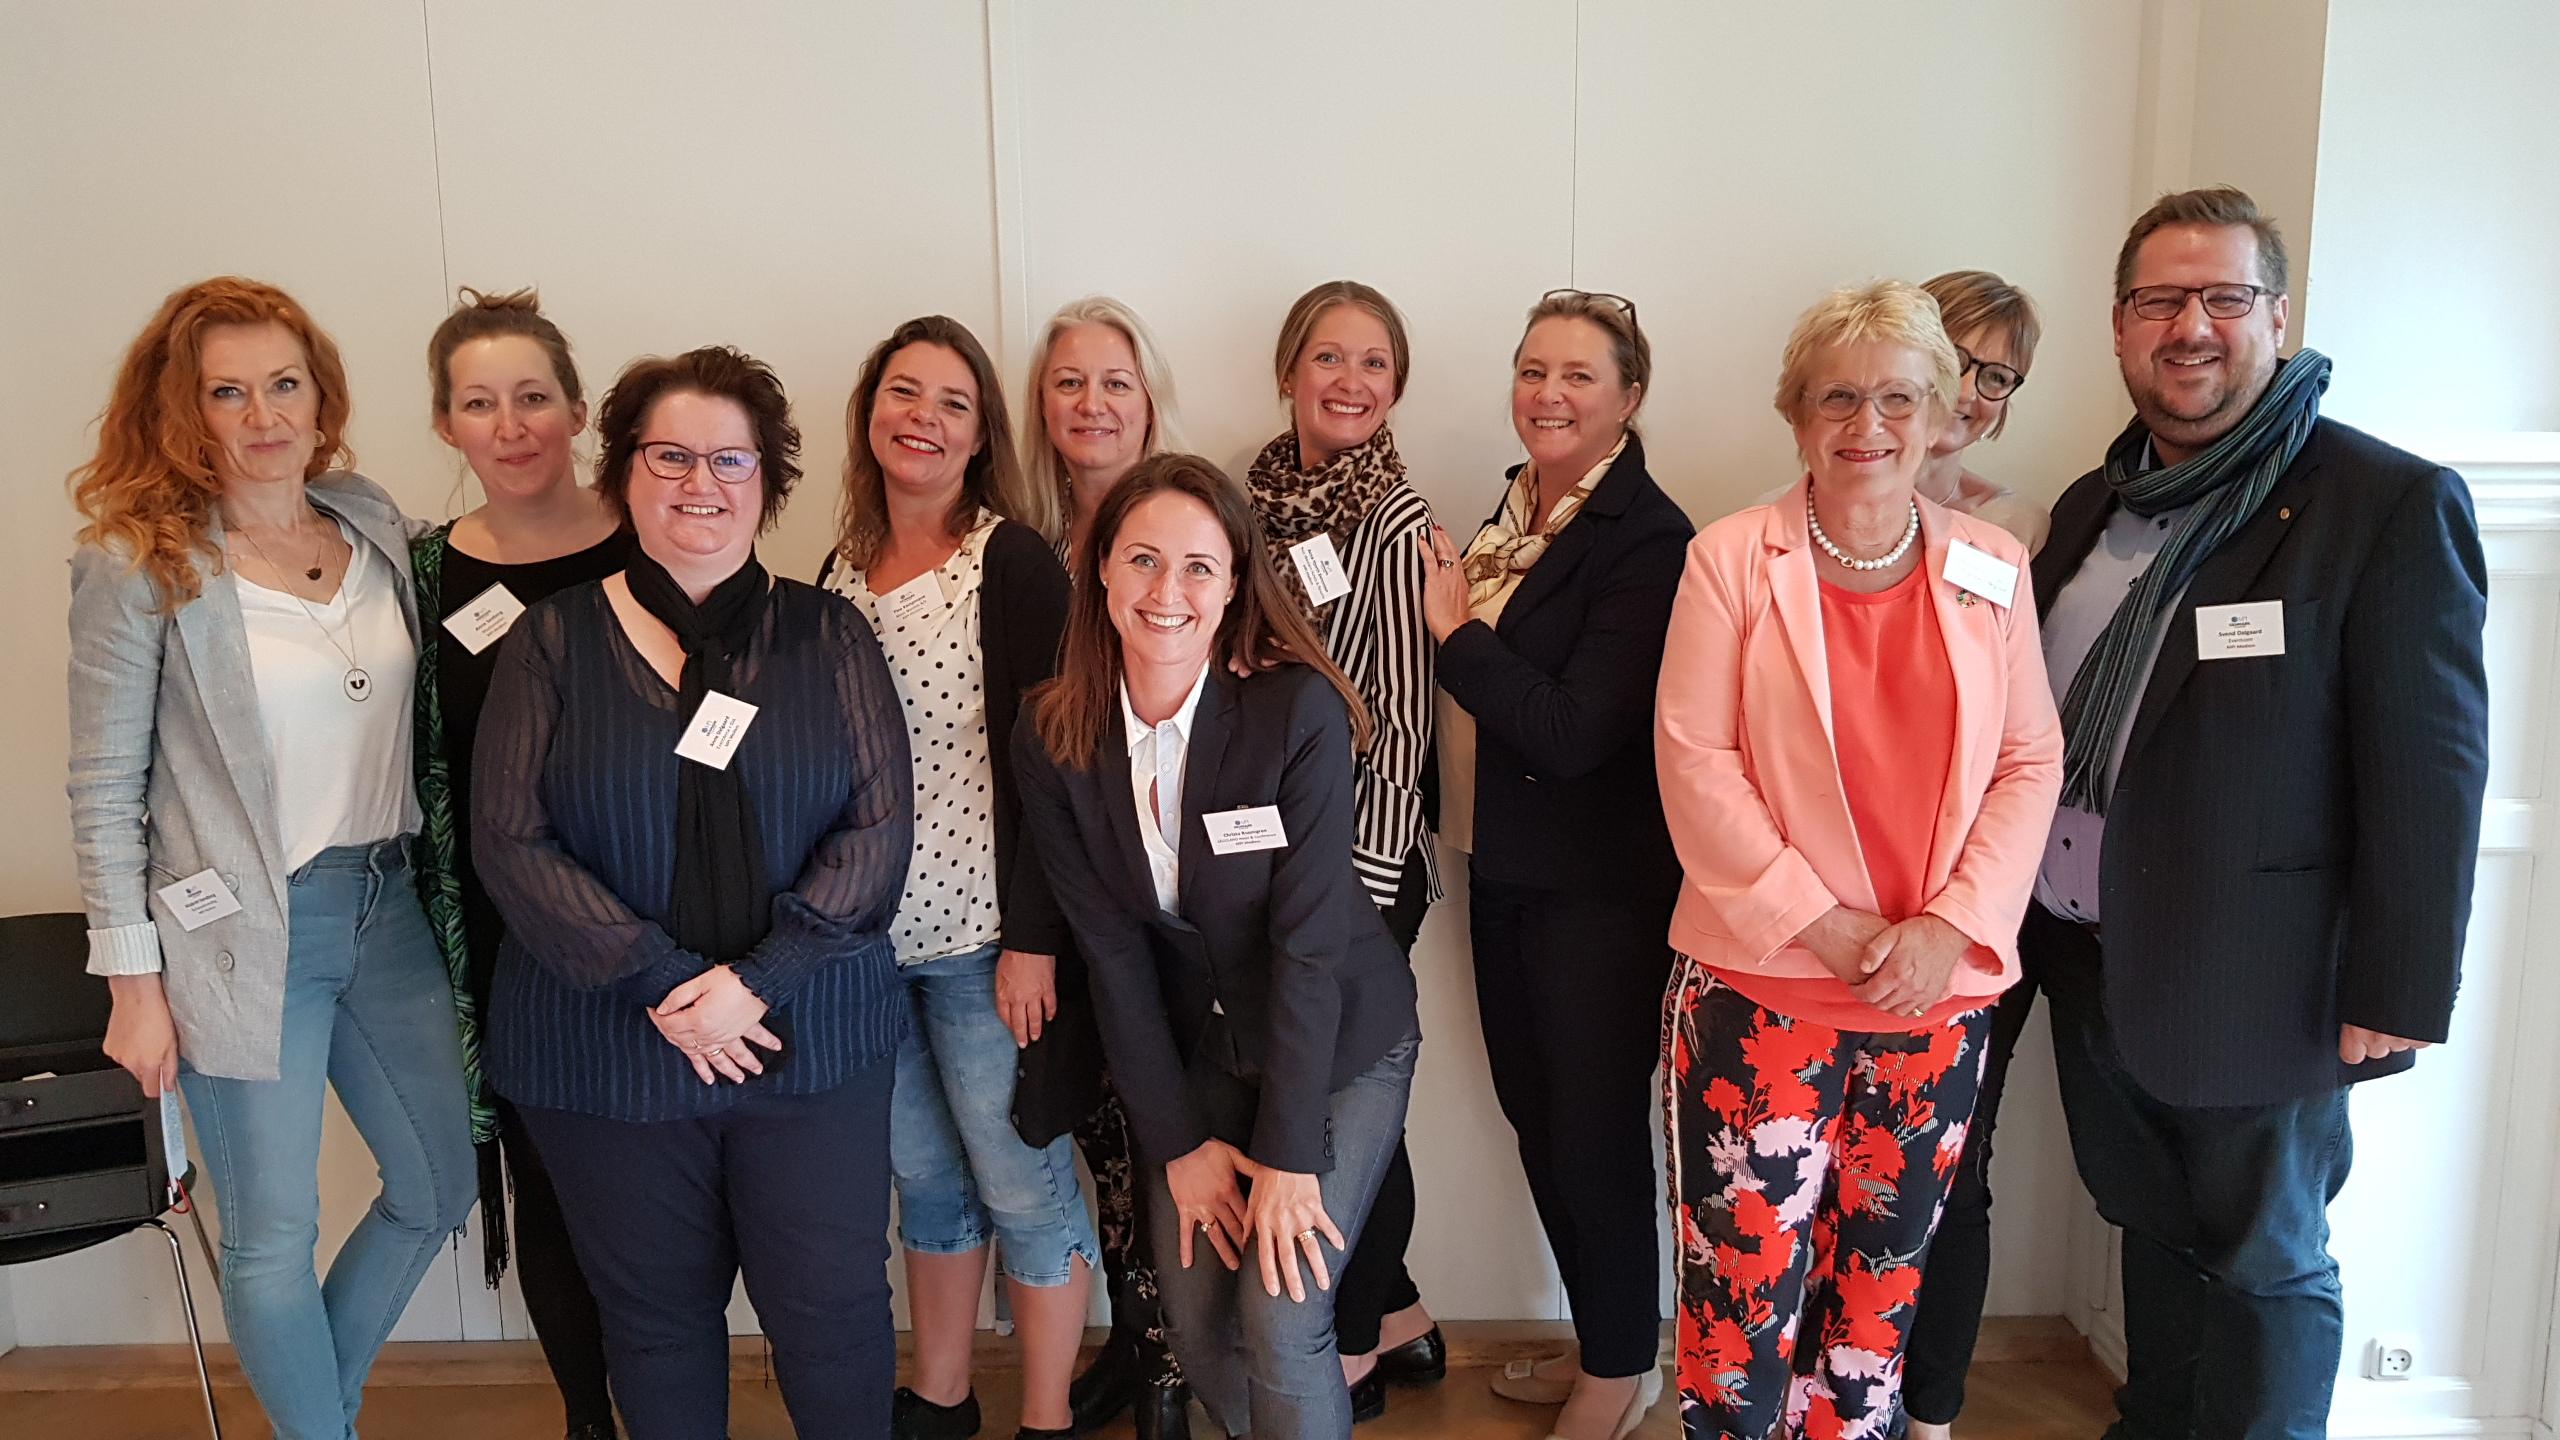 De fleste medlemmer af den nye MPI Denmark bestyrelse, fra venstre formand Majbritt Sandberg, Anne Seeberg, Anne Dalgaard, Tine Kampmann, Didde Steinmann, Christa Rosengren, Anna Hjorth Simonsen, Tina Wolstrup, Hanne Tulinius, Christina Spangsberg, Svend Dalgaard. Foto: MPI.